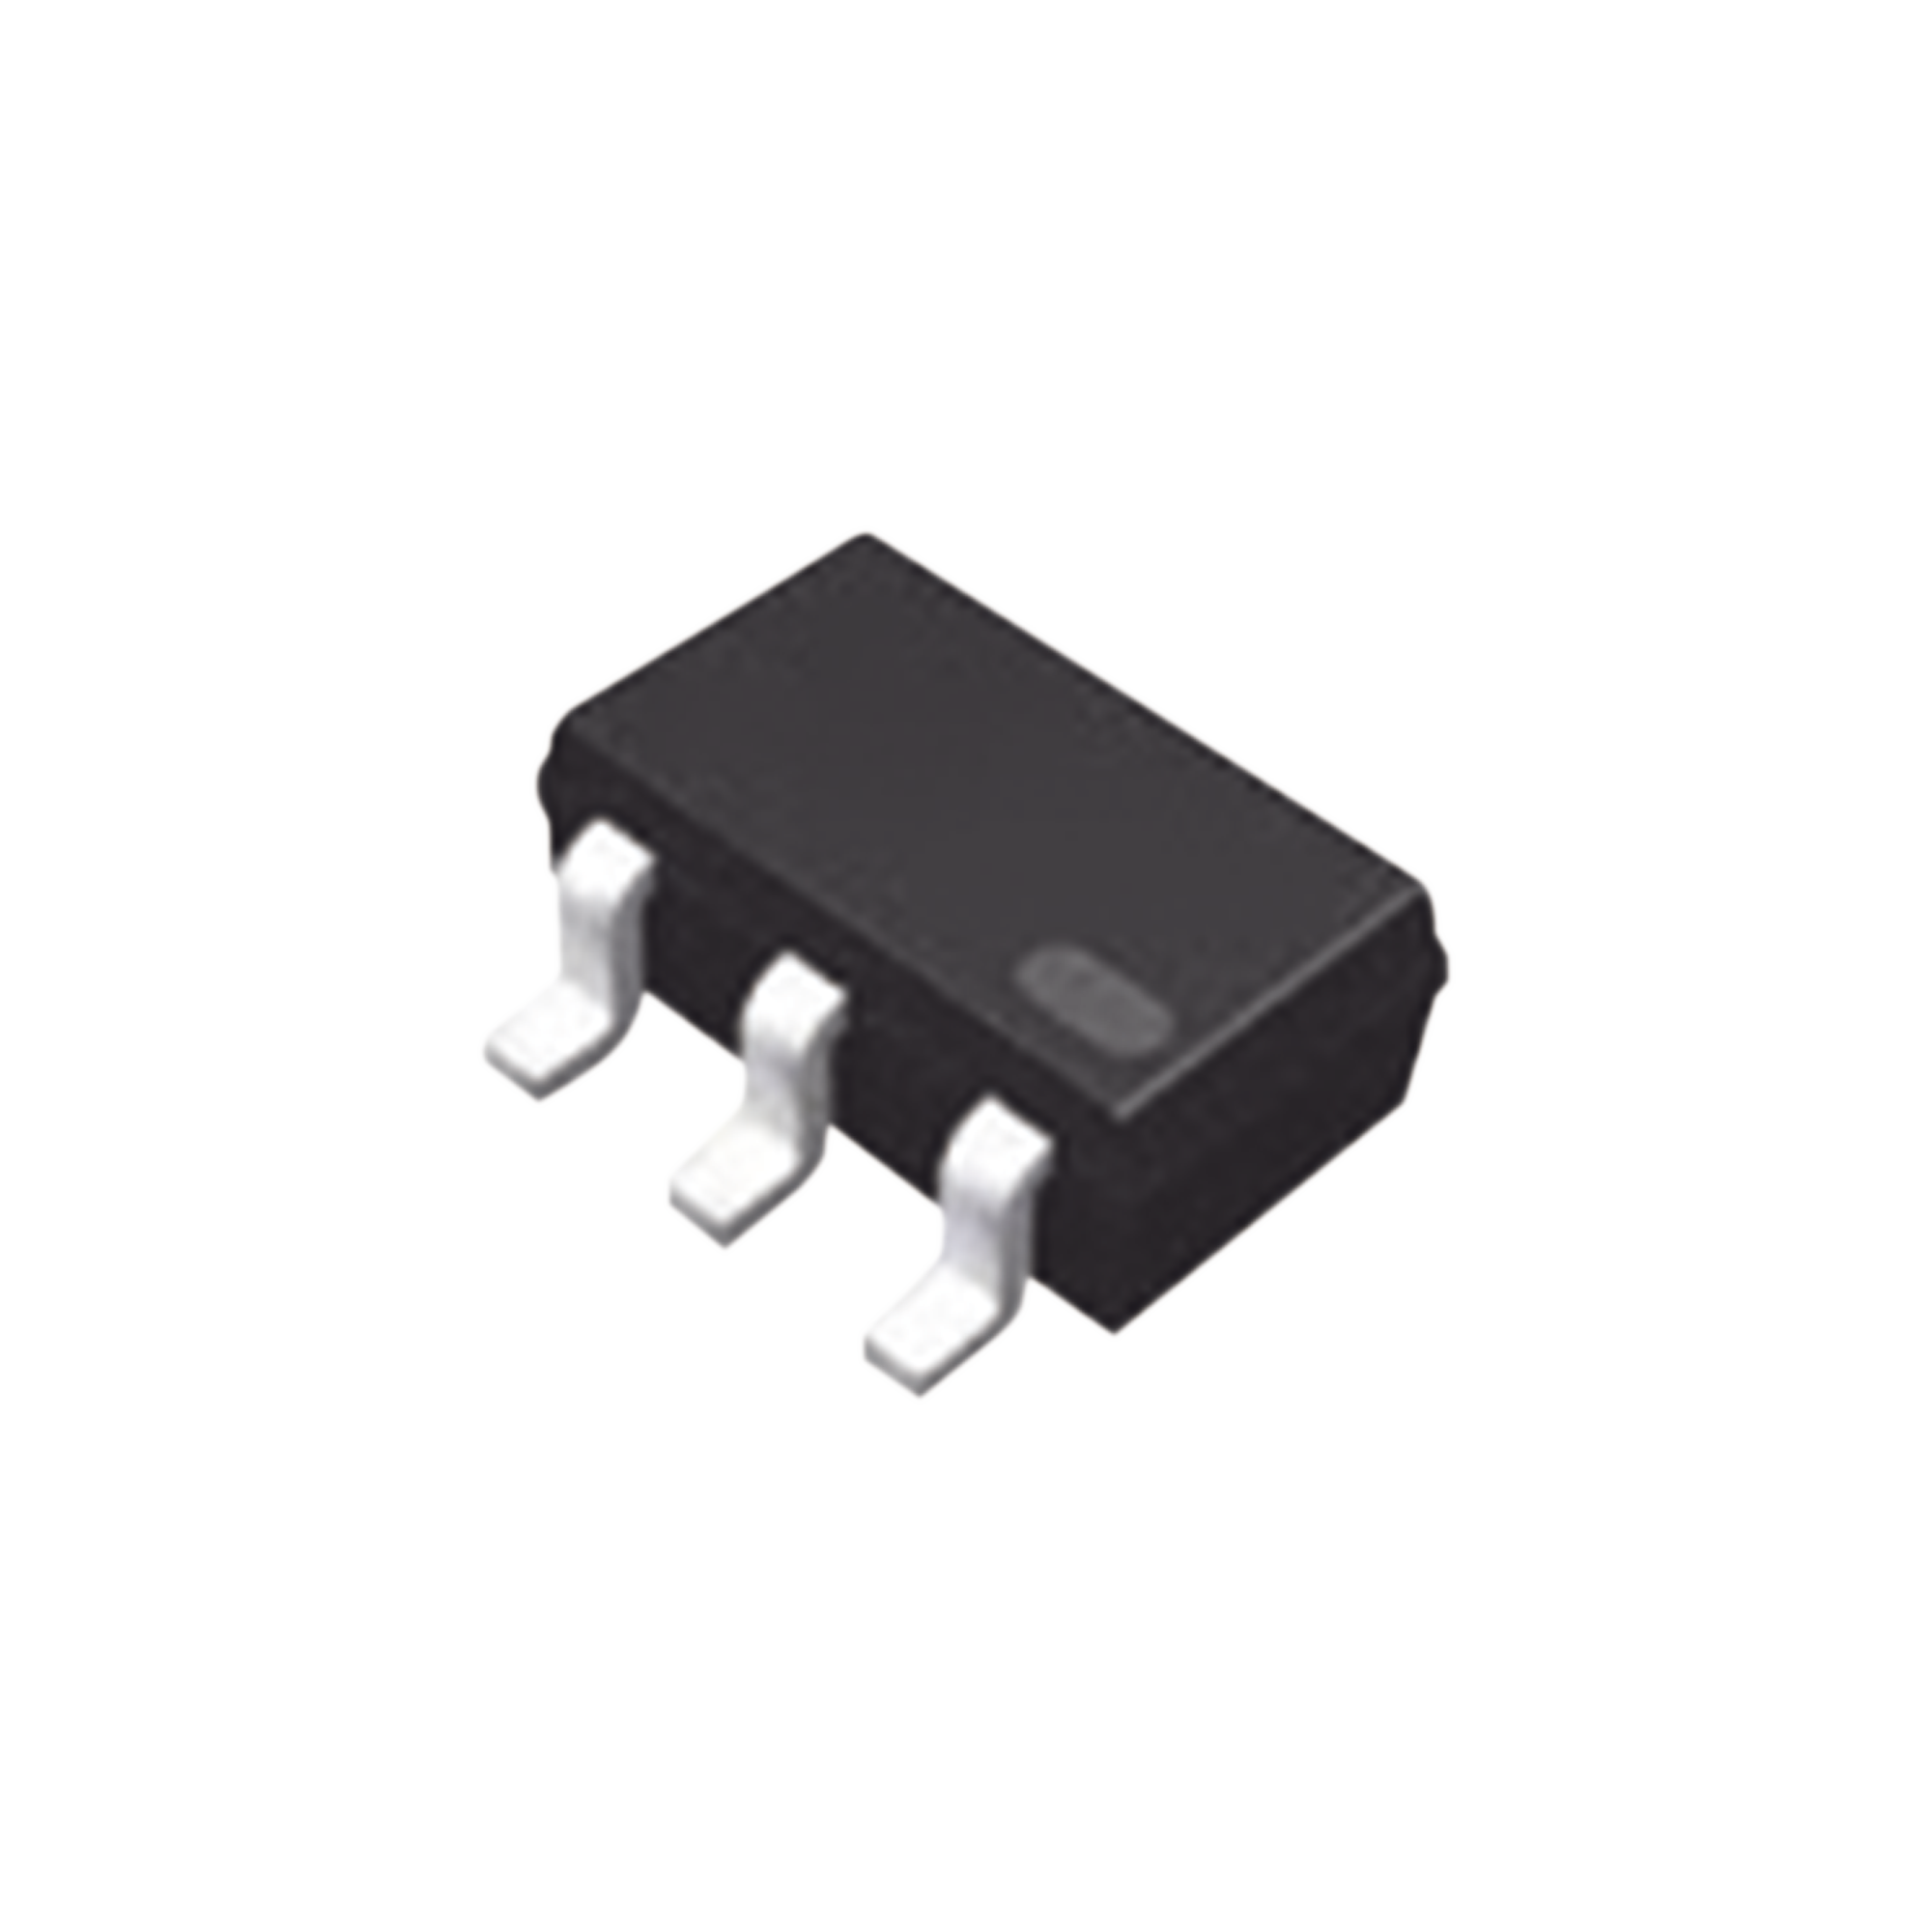 Atenuador de 40 dB para 0.5-3.0 GHz, para Monitor Ramsey COM-3010.